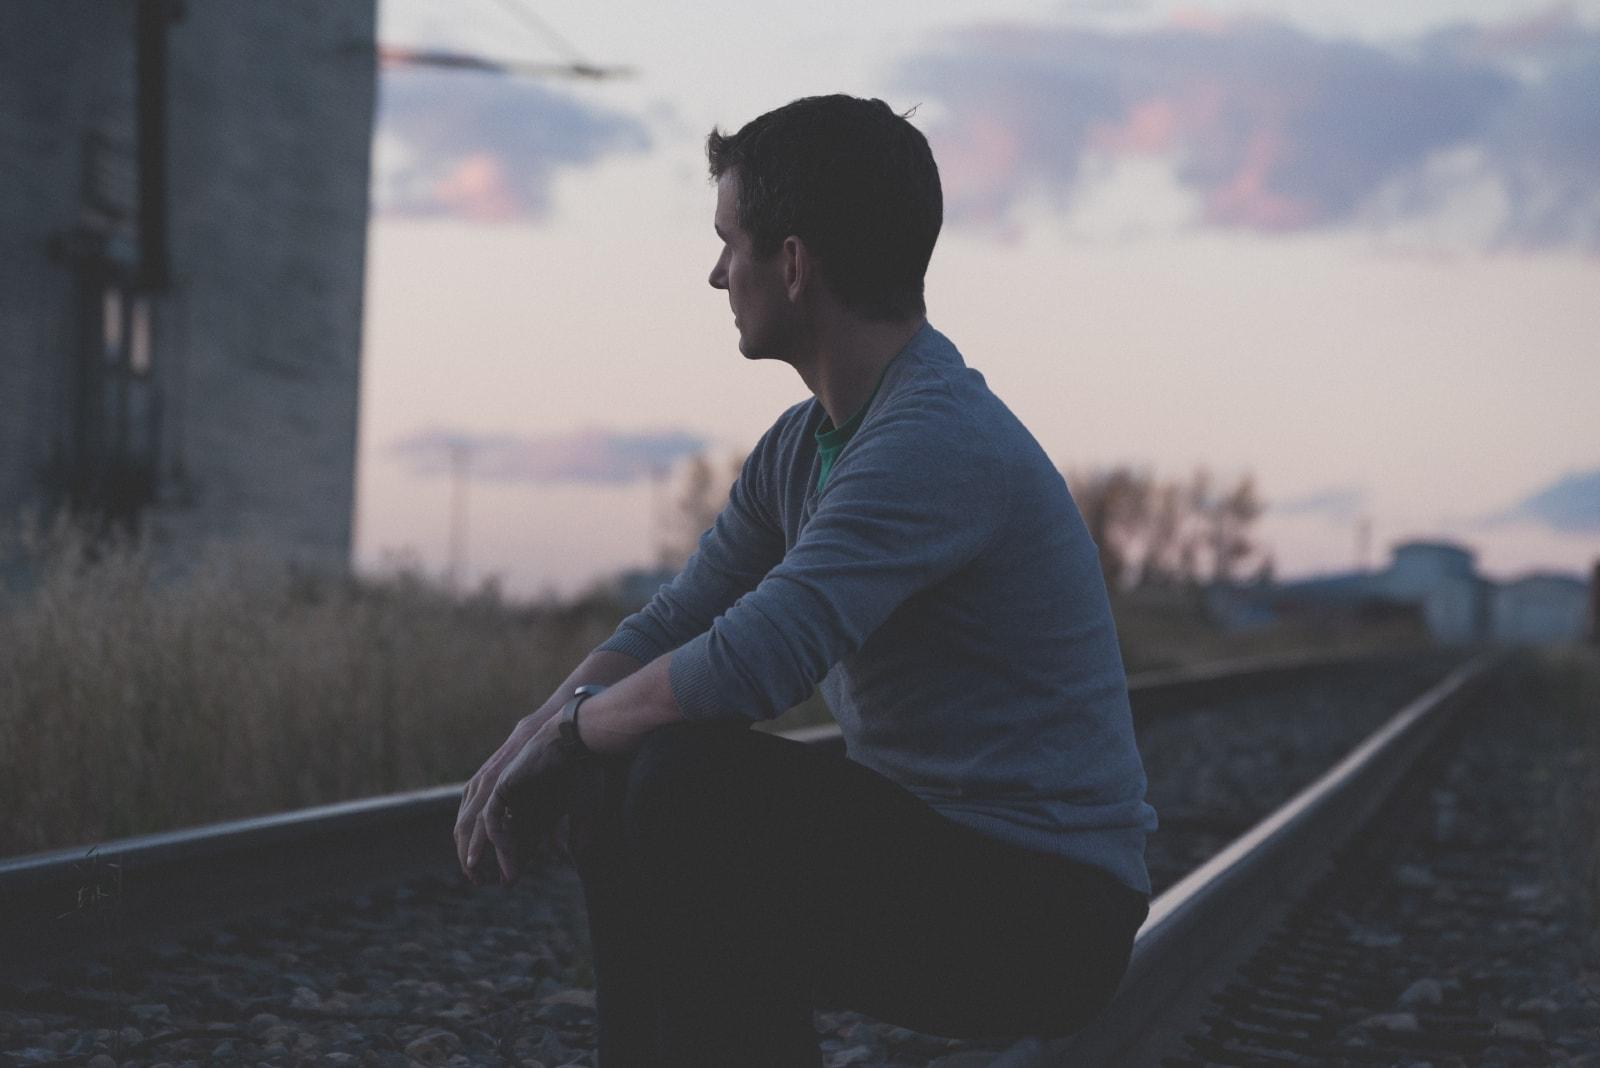 man in gray sweater sitting on railway